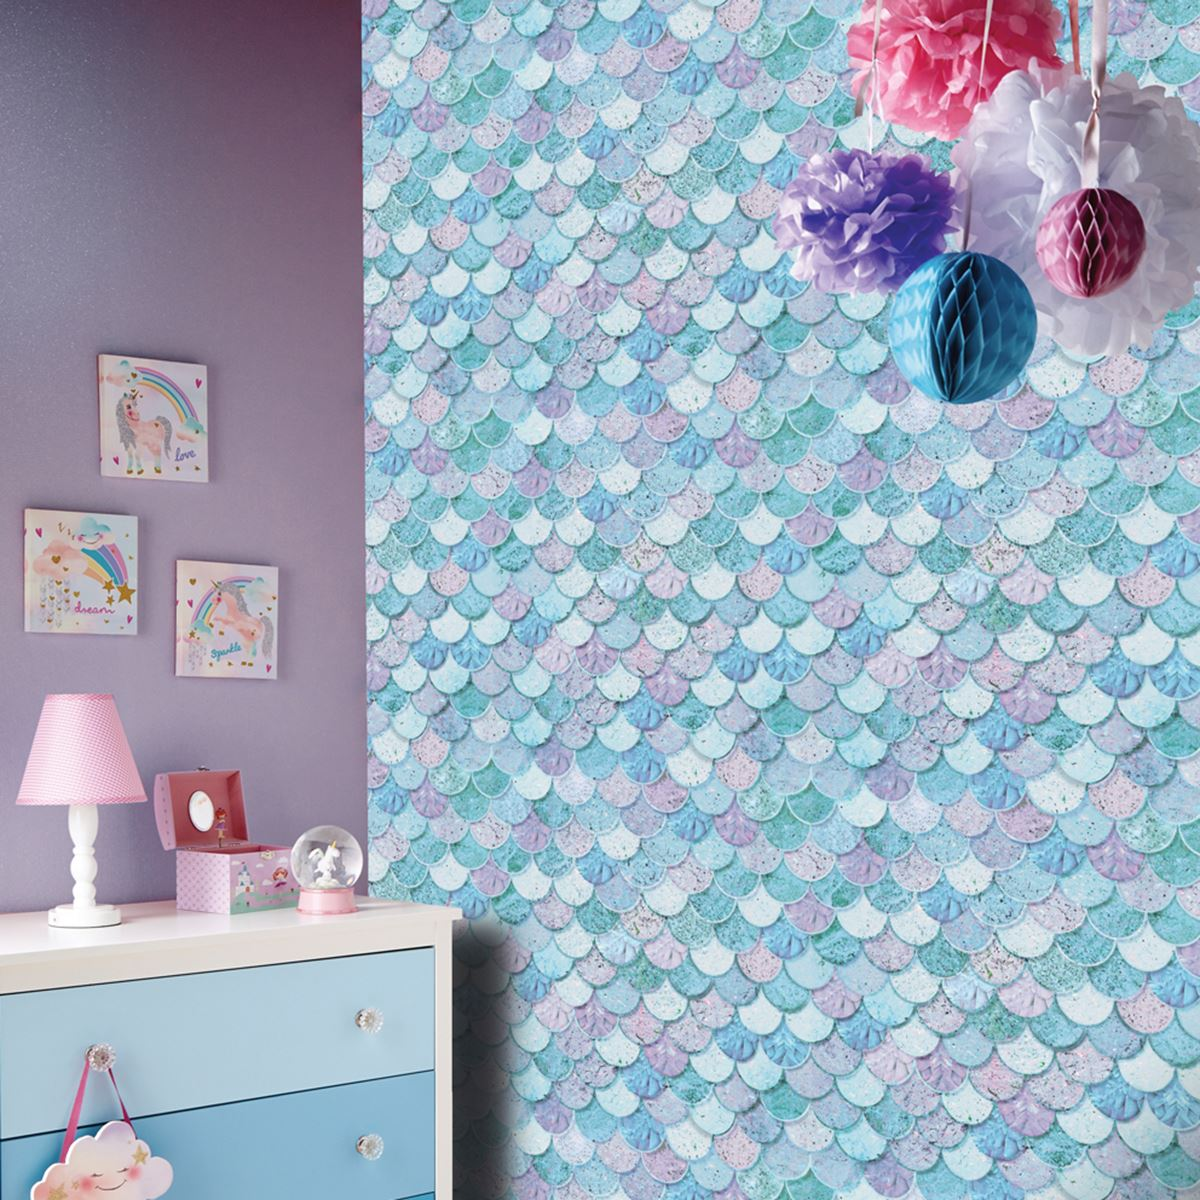 Mermazing Mermaid Scales Glitter Wallpaper Arthouse